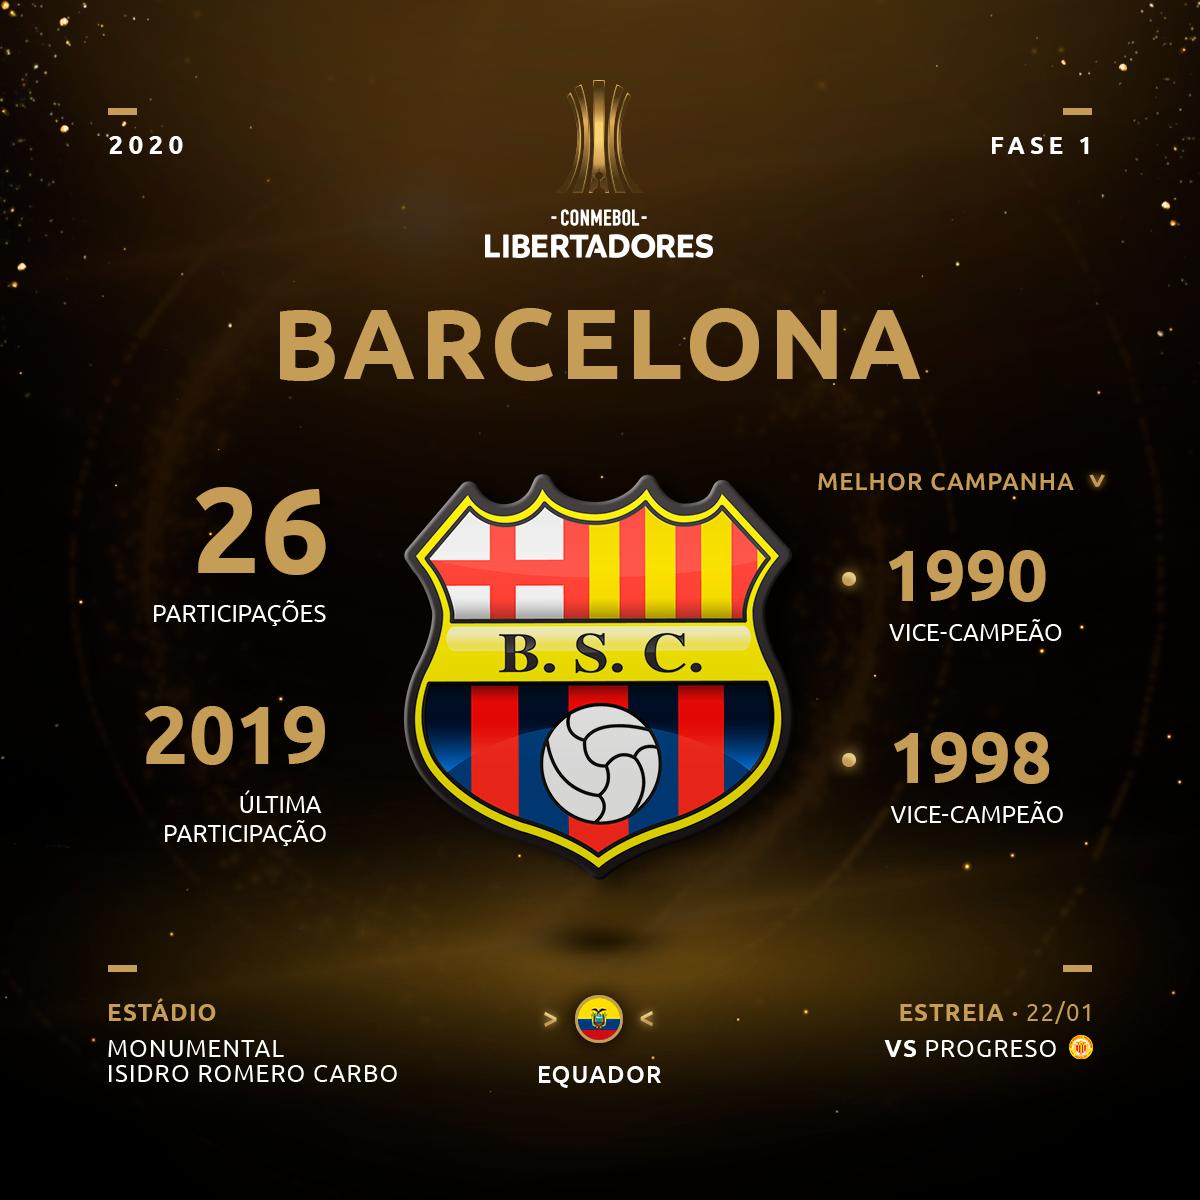 Barcelona - Libertadores 2020